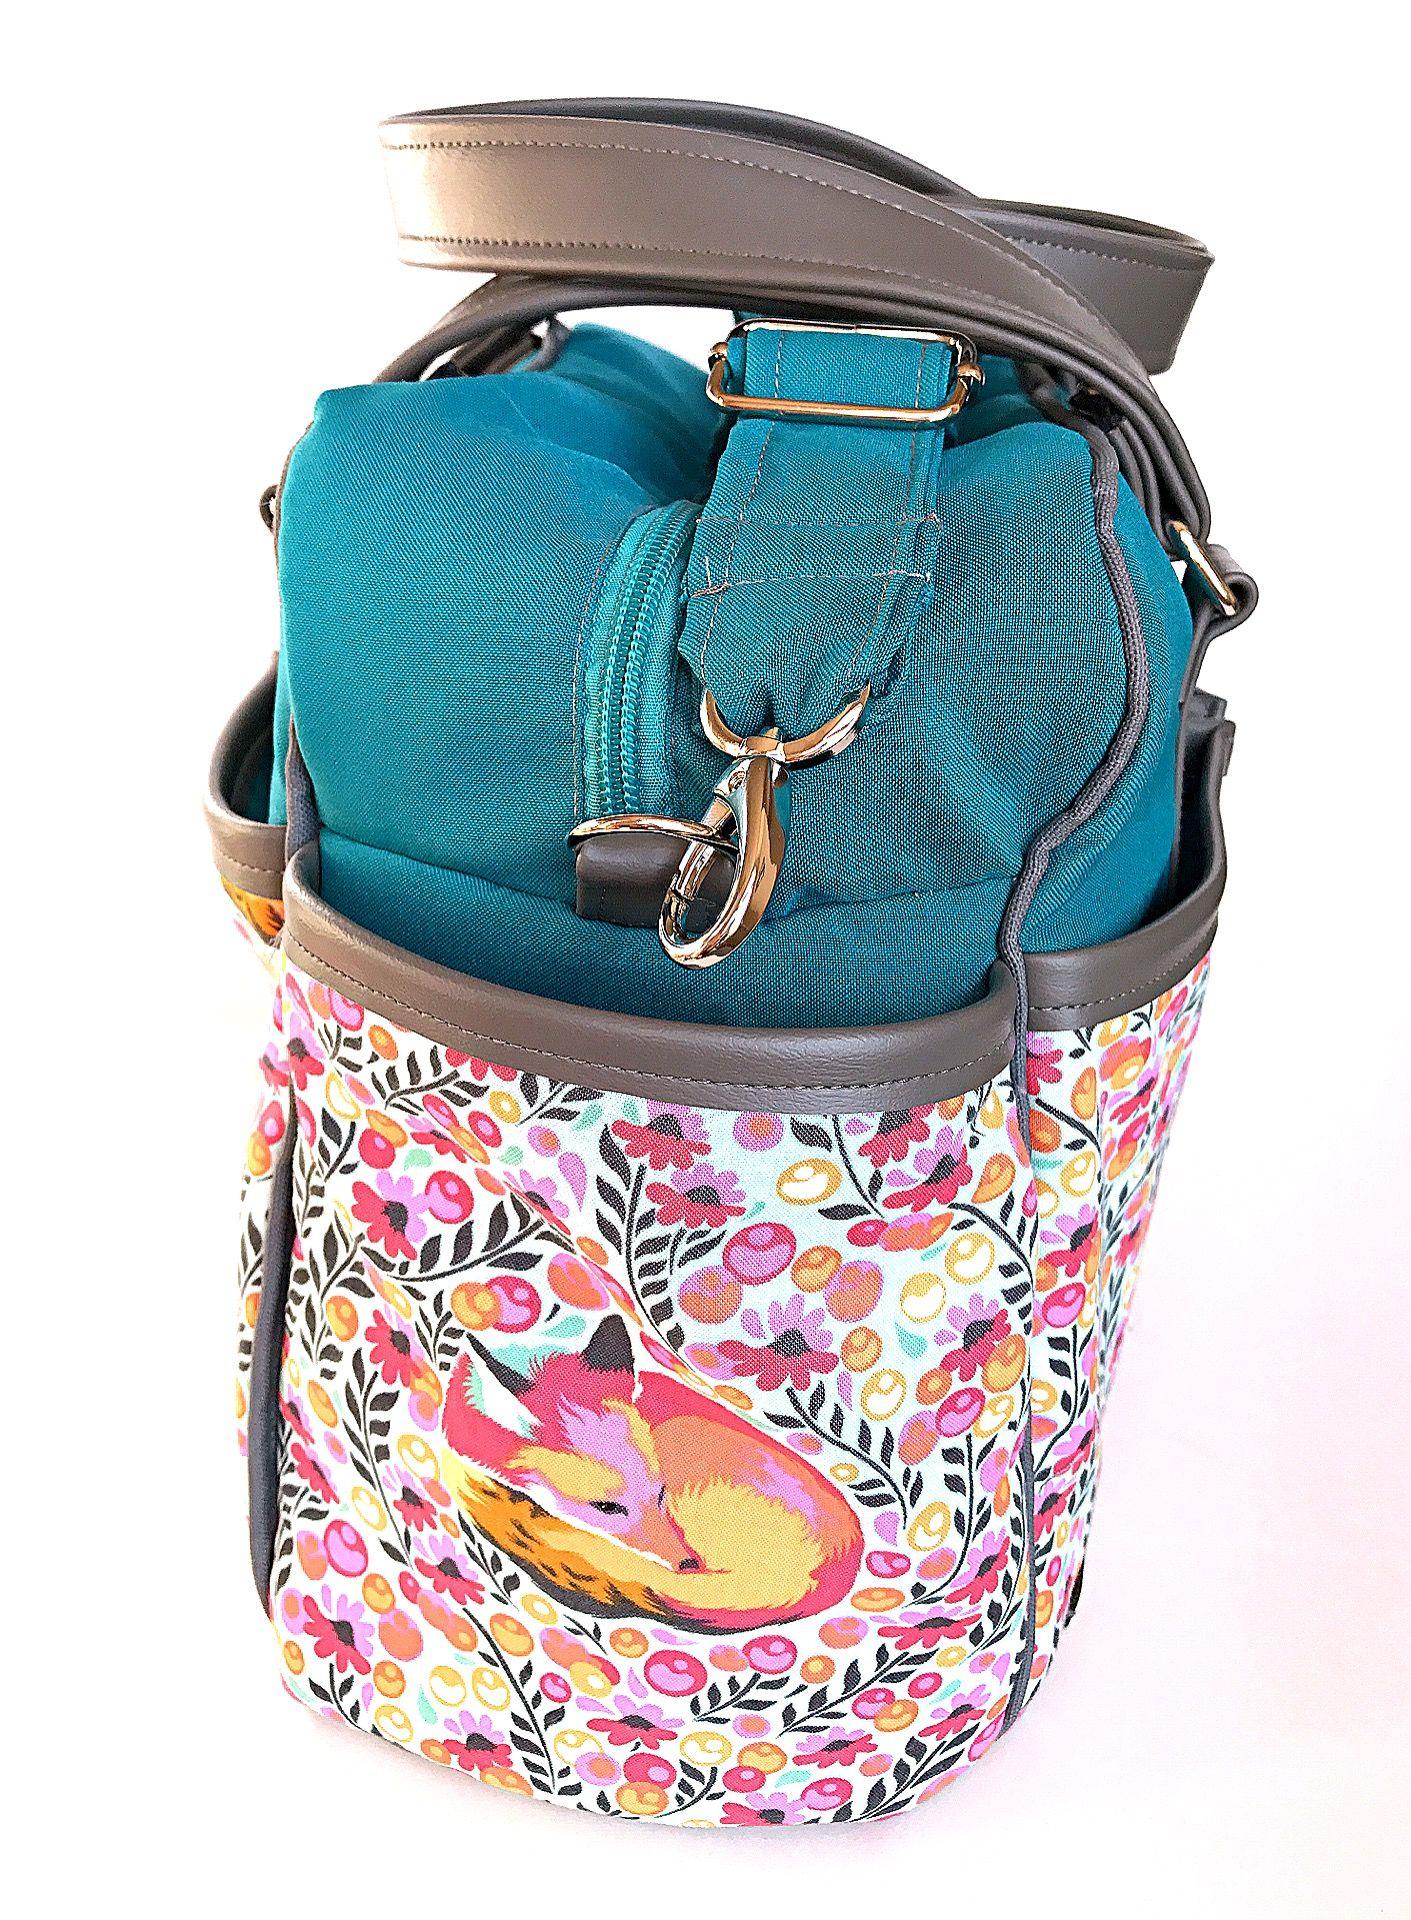 Fox Diaper bag with 8 slip pockets and 1 zipper pocket